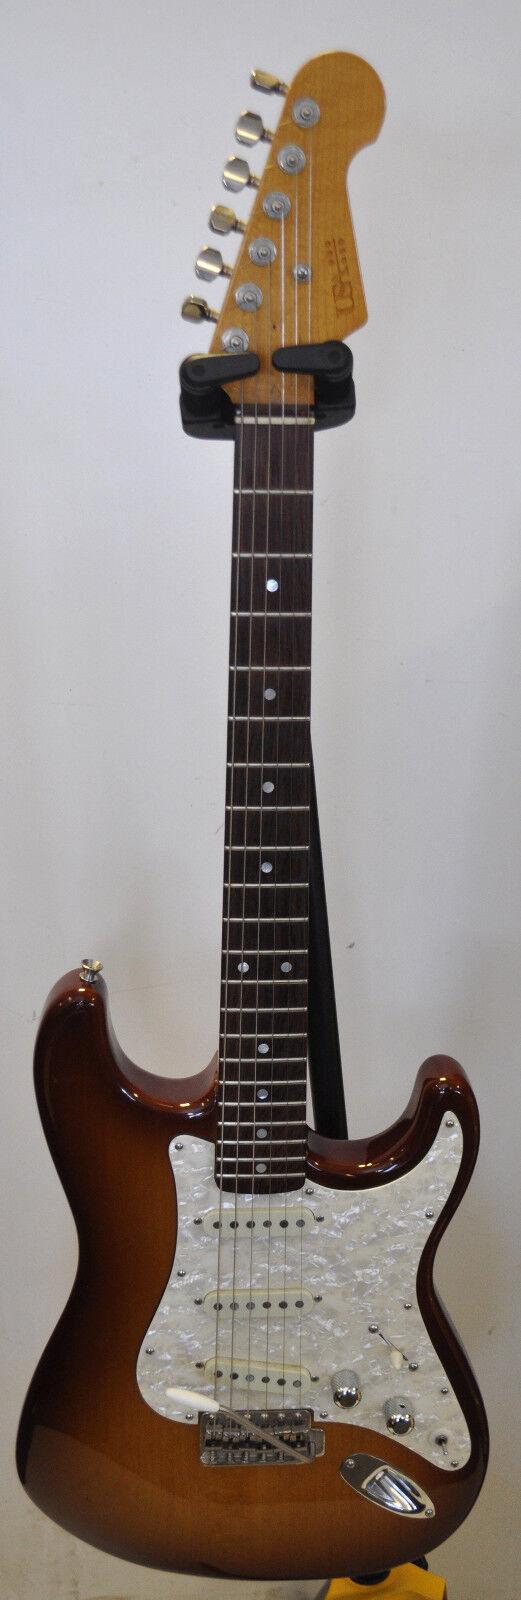 USA guitarras Personalizado (usacg) 2003 Honeyburst grando. grando. grando. Satén Stratocaster Menta  gran descuento